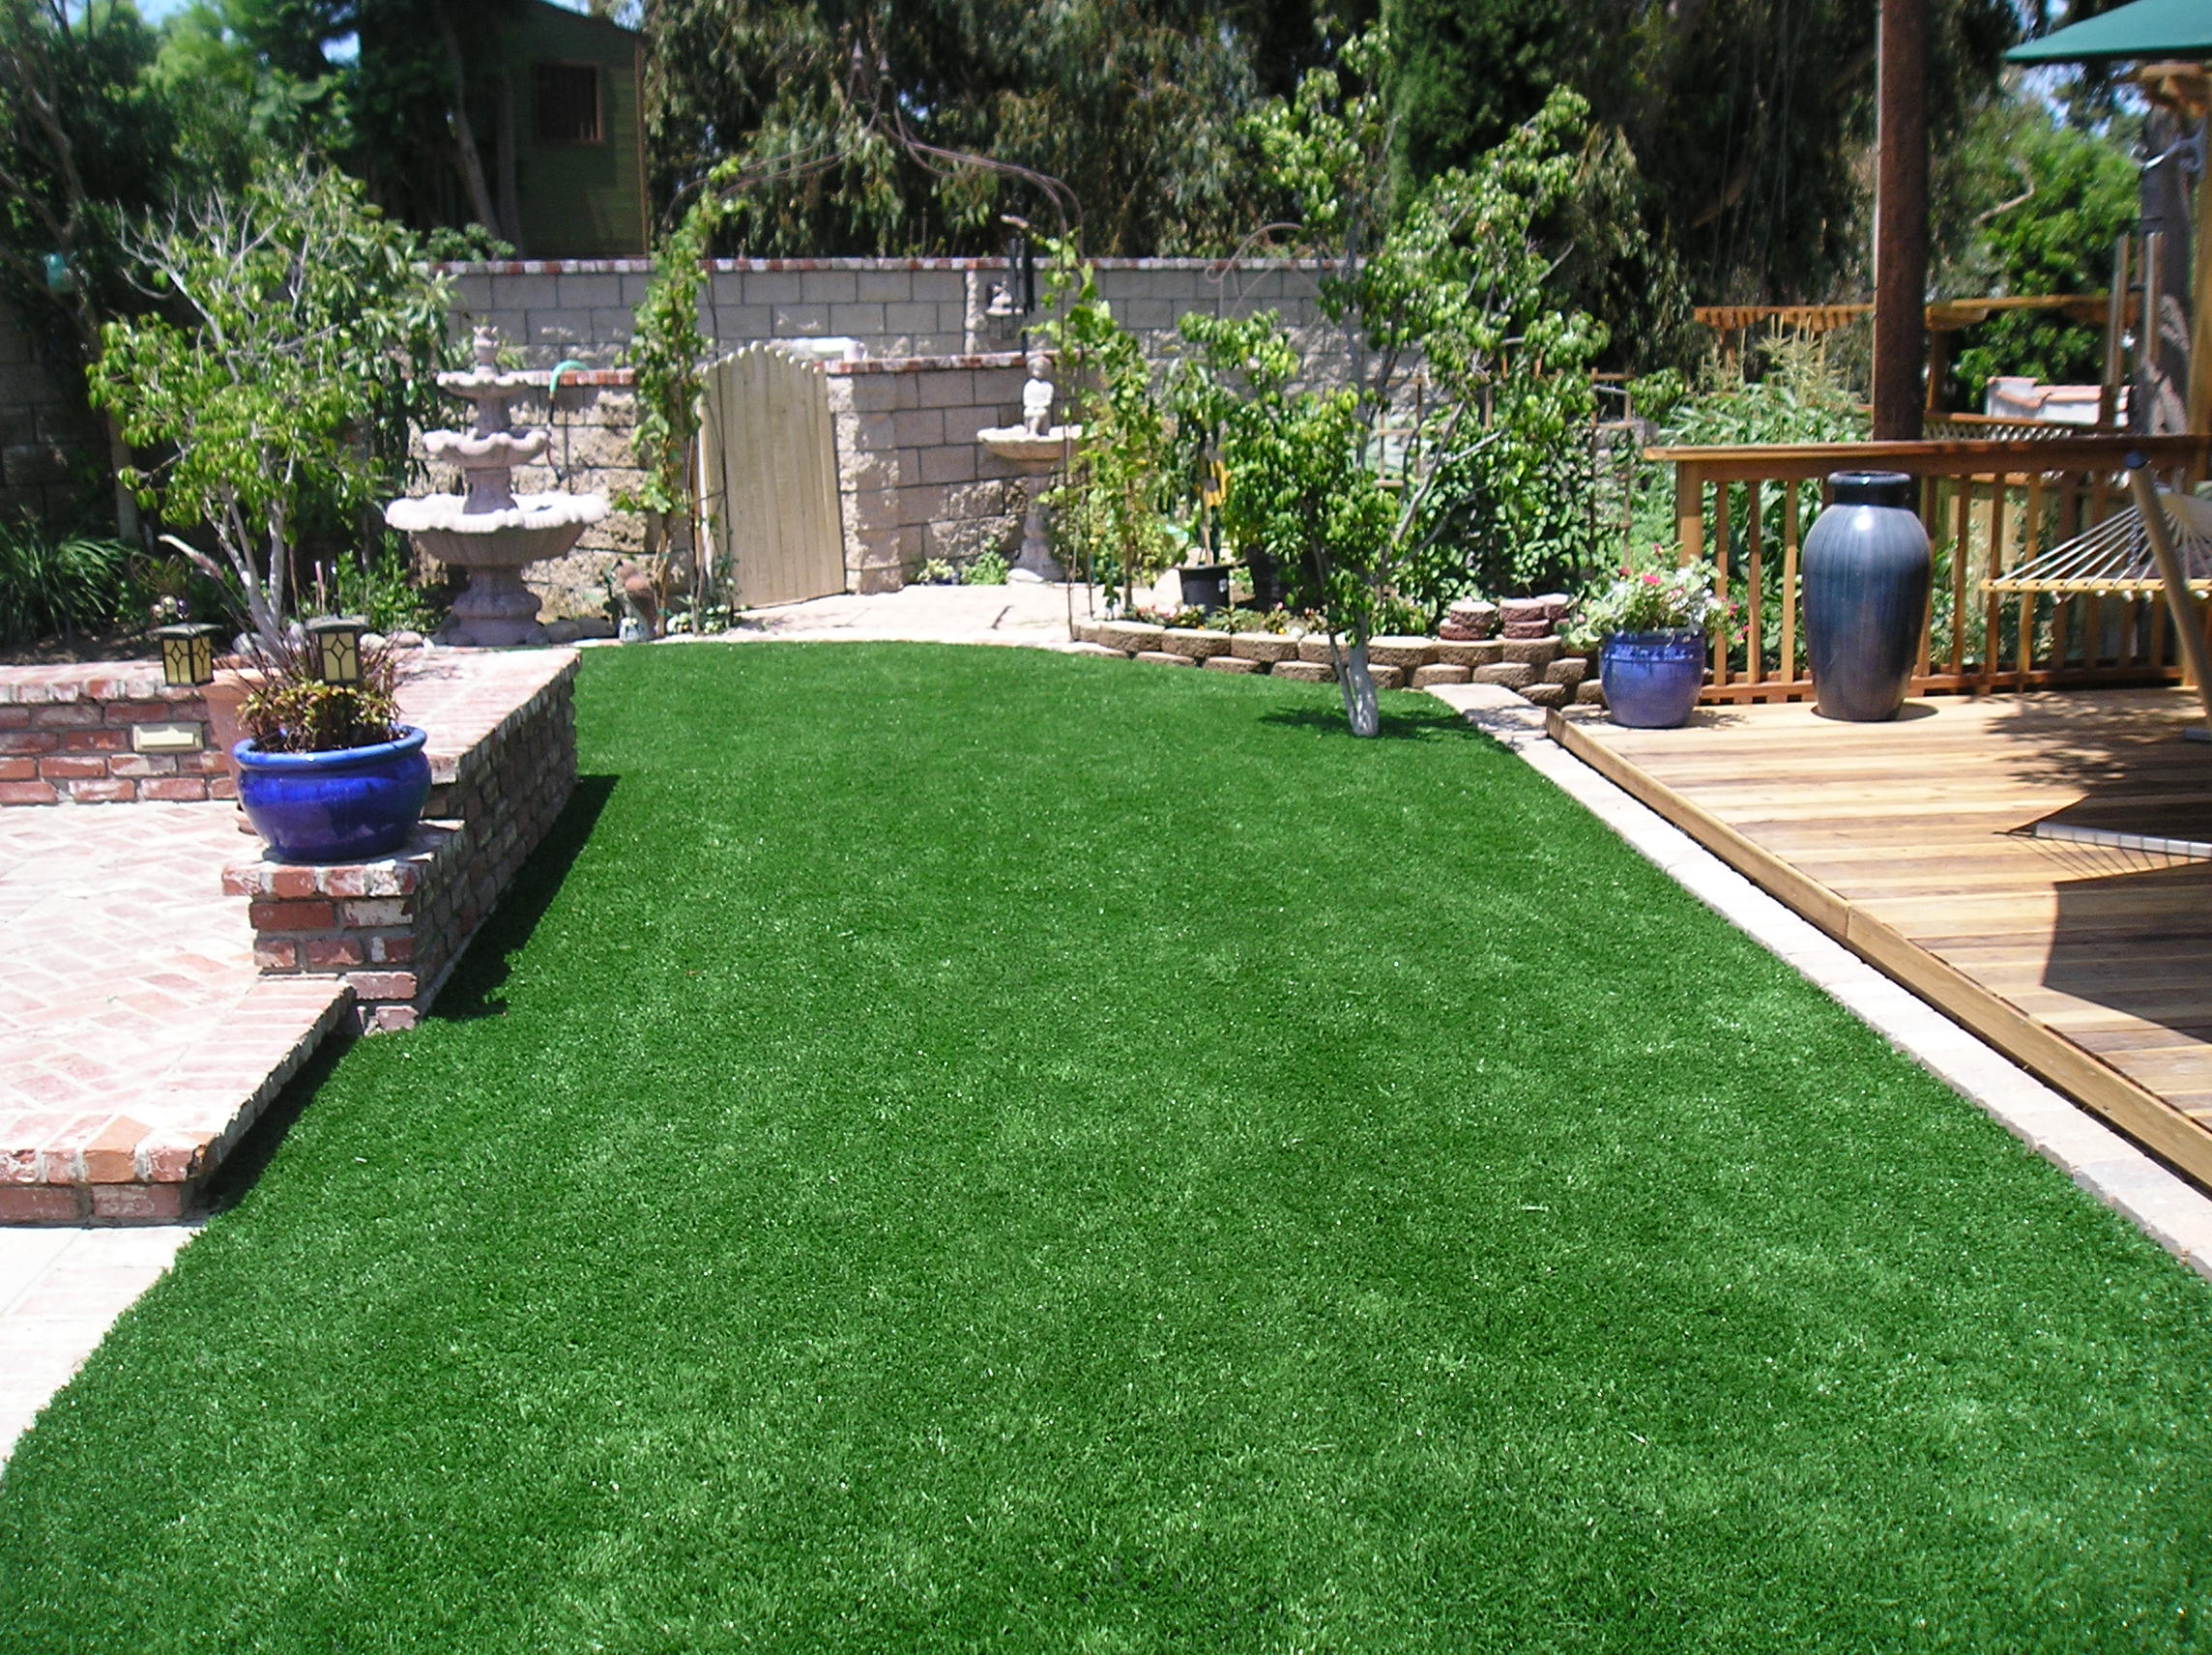 Riviera Monterey-65 artificial lawn,synthetic lawn,fake lawn,turf lawn,fake grass lawn,artificial lawn,synthetic lawn,fake lawn,turf lawn,fake grass lawn